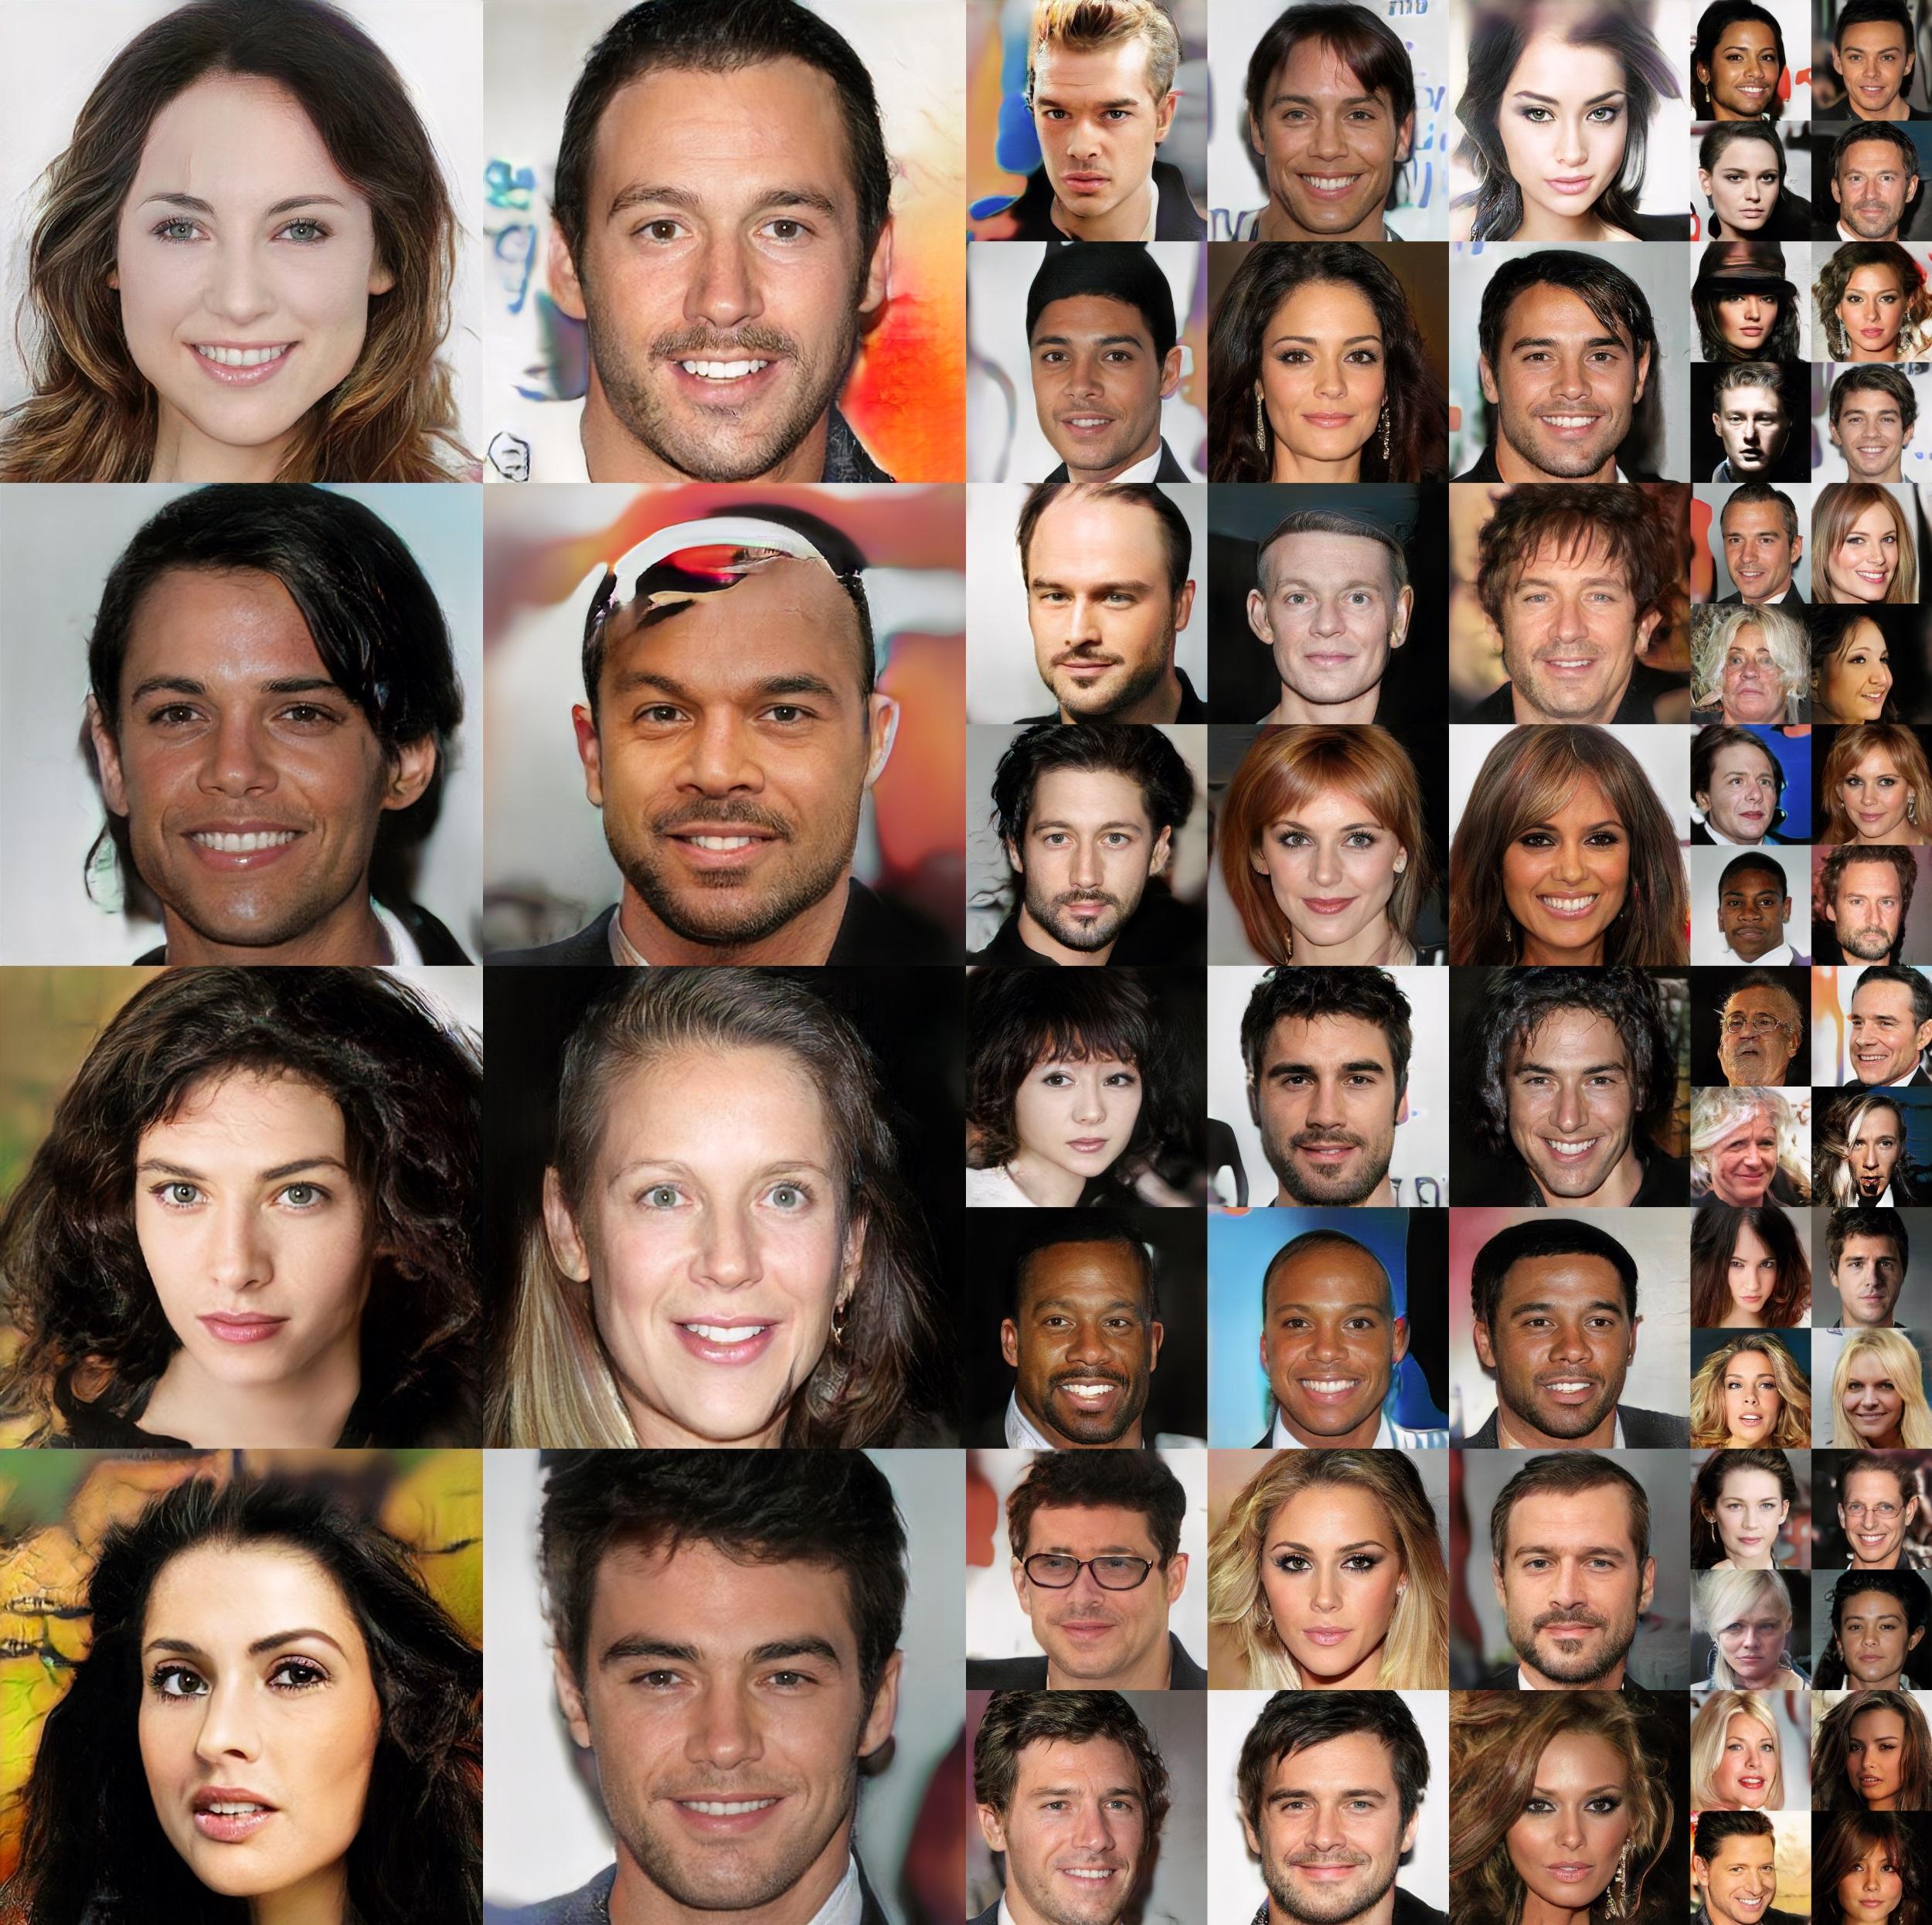 Celebrity Celebrity celebs naked (25 photos), Ass, Leaked, Selfie, lingerie 2018